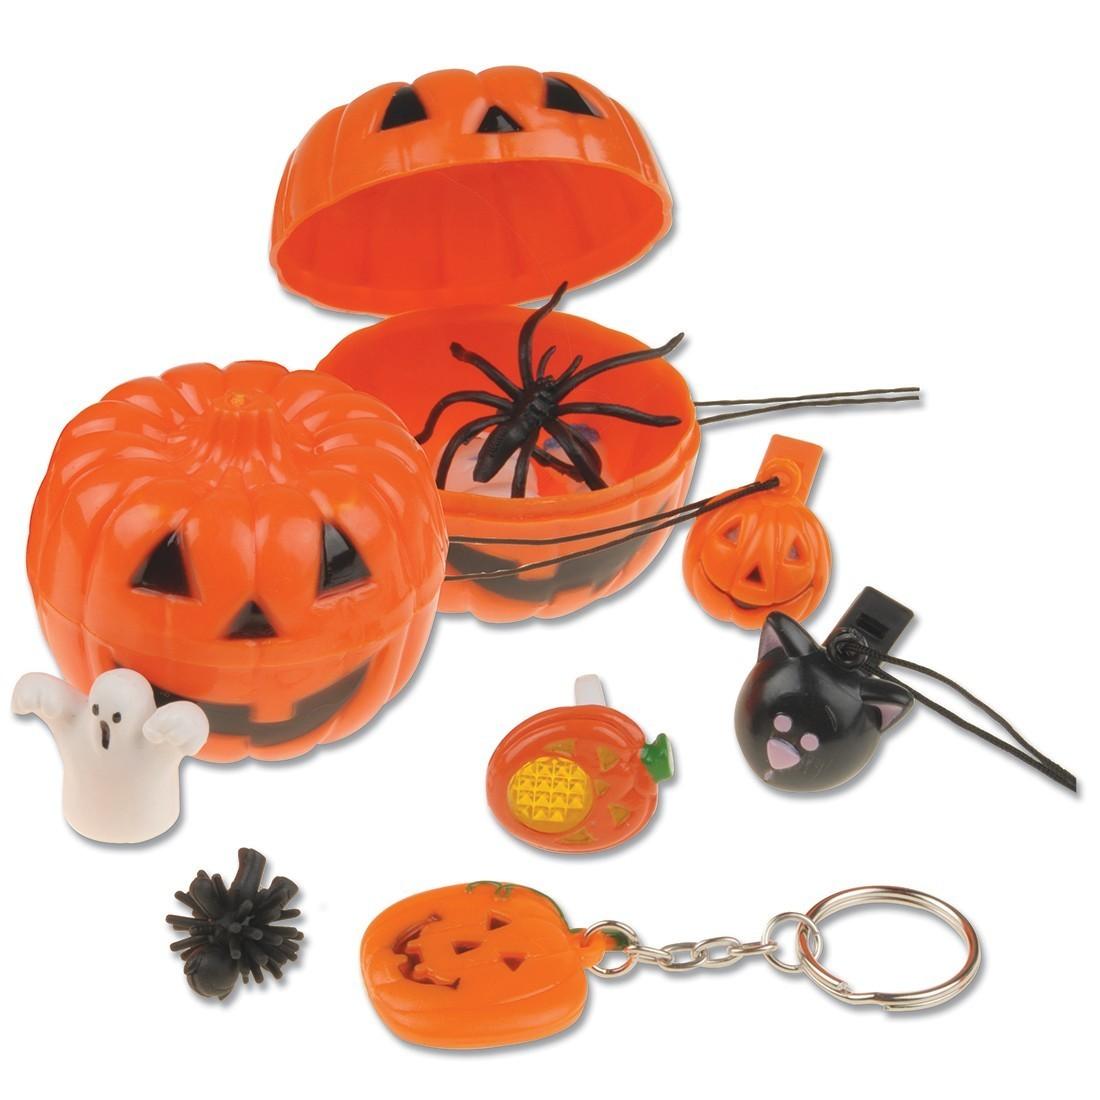 Toy Filled Jack-O-Lanterns [image]